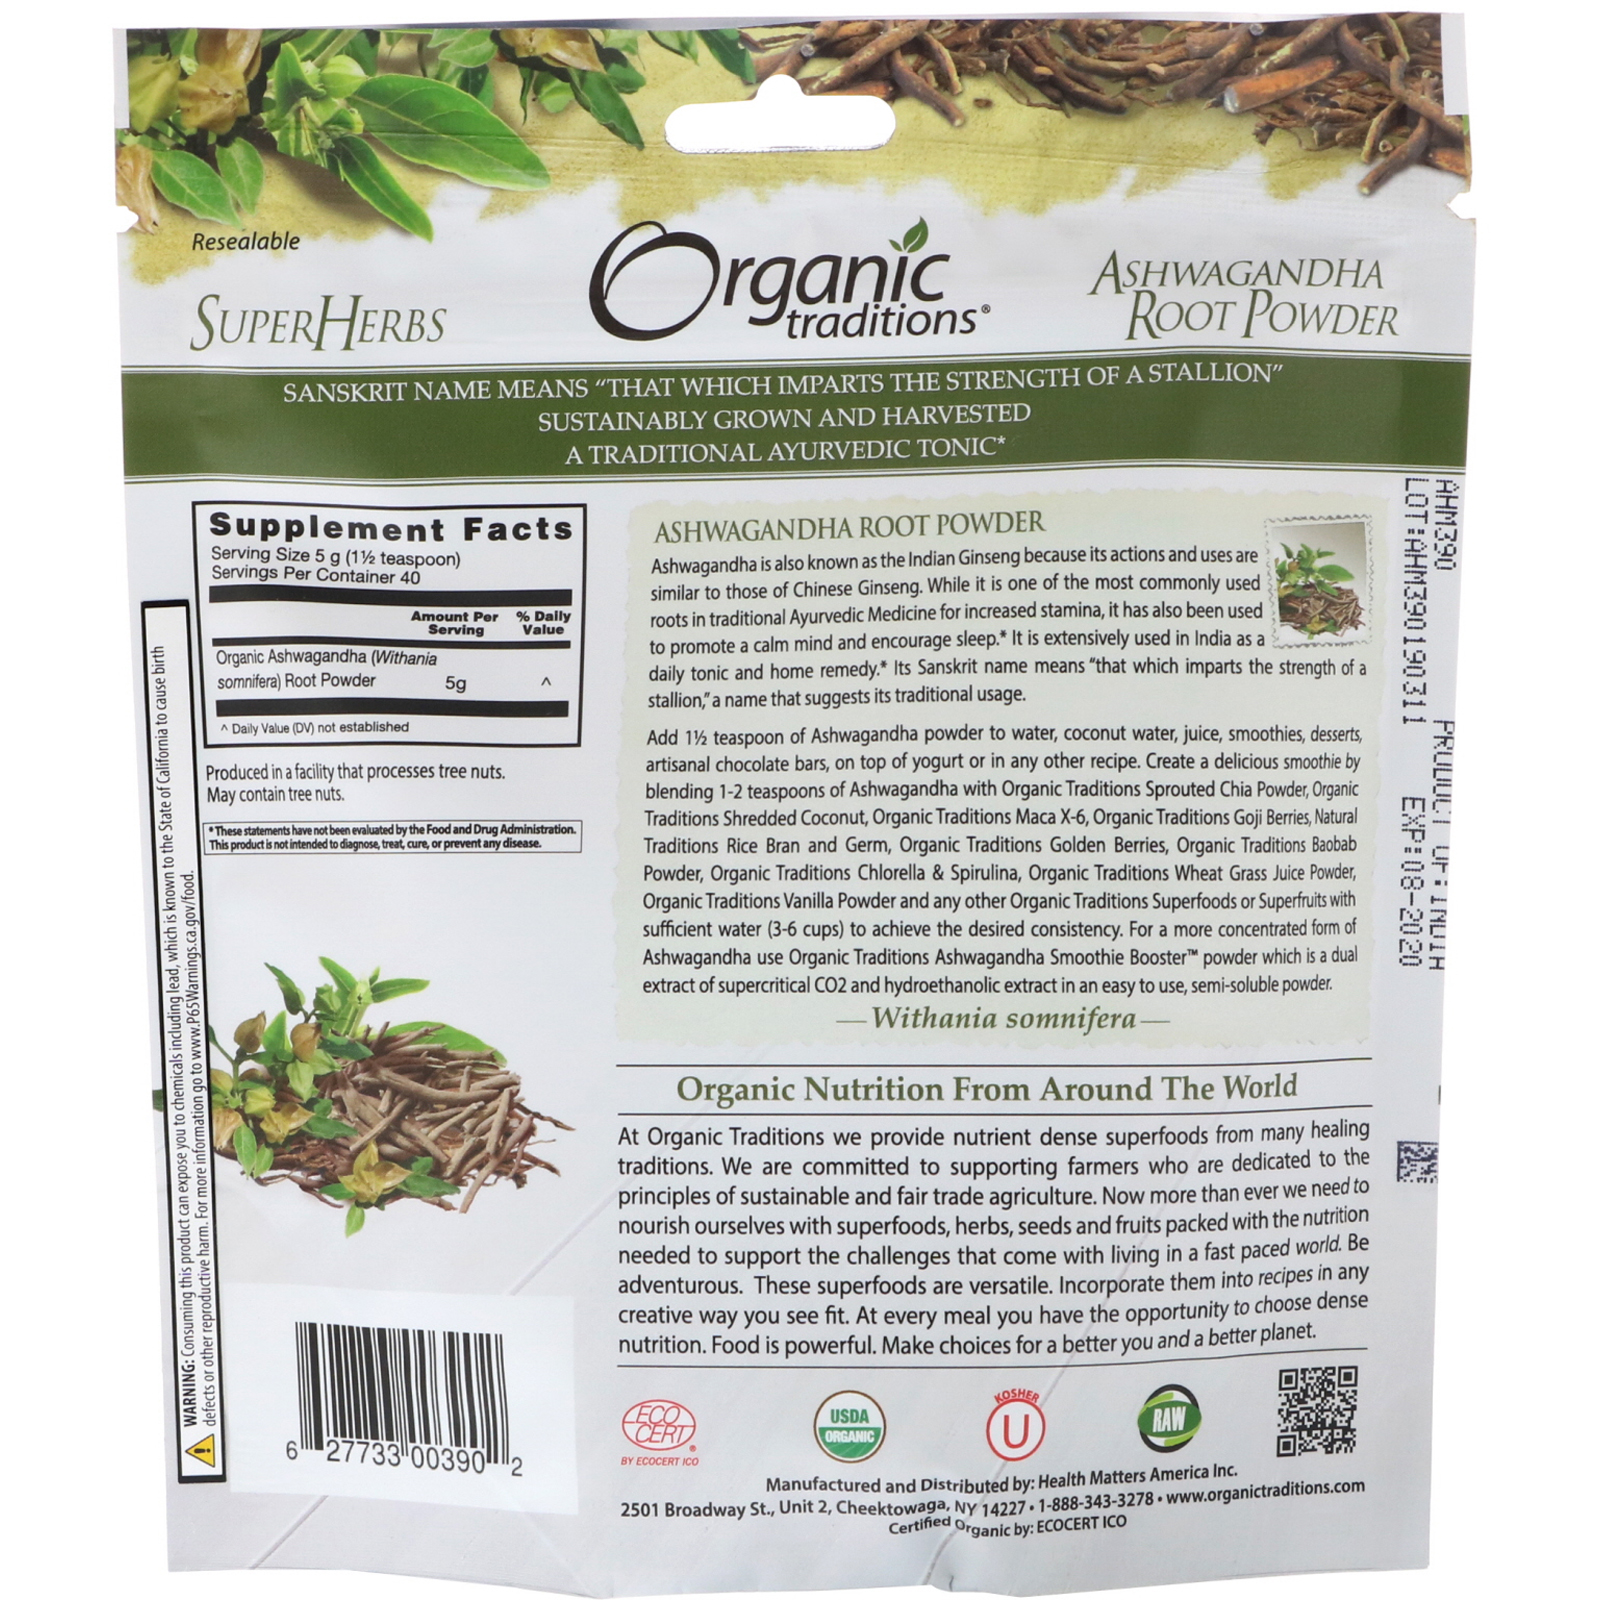 Organic Traditions, Ashwagandha Root Powder, 7 oz (200 g